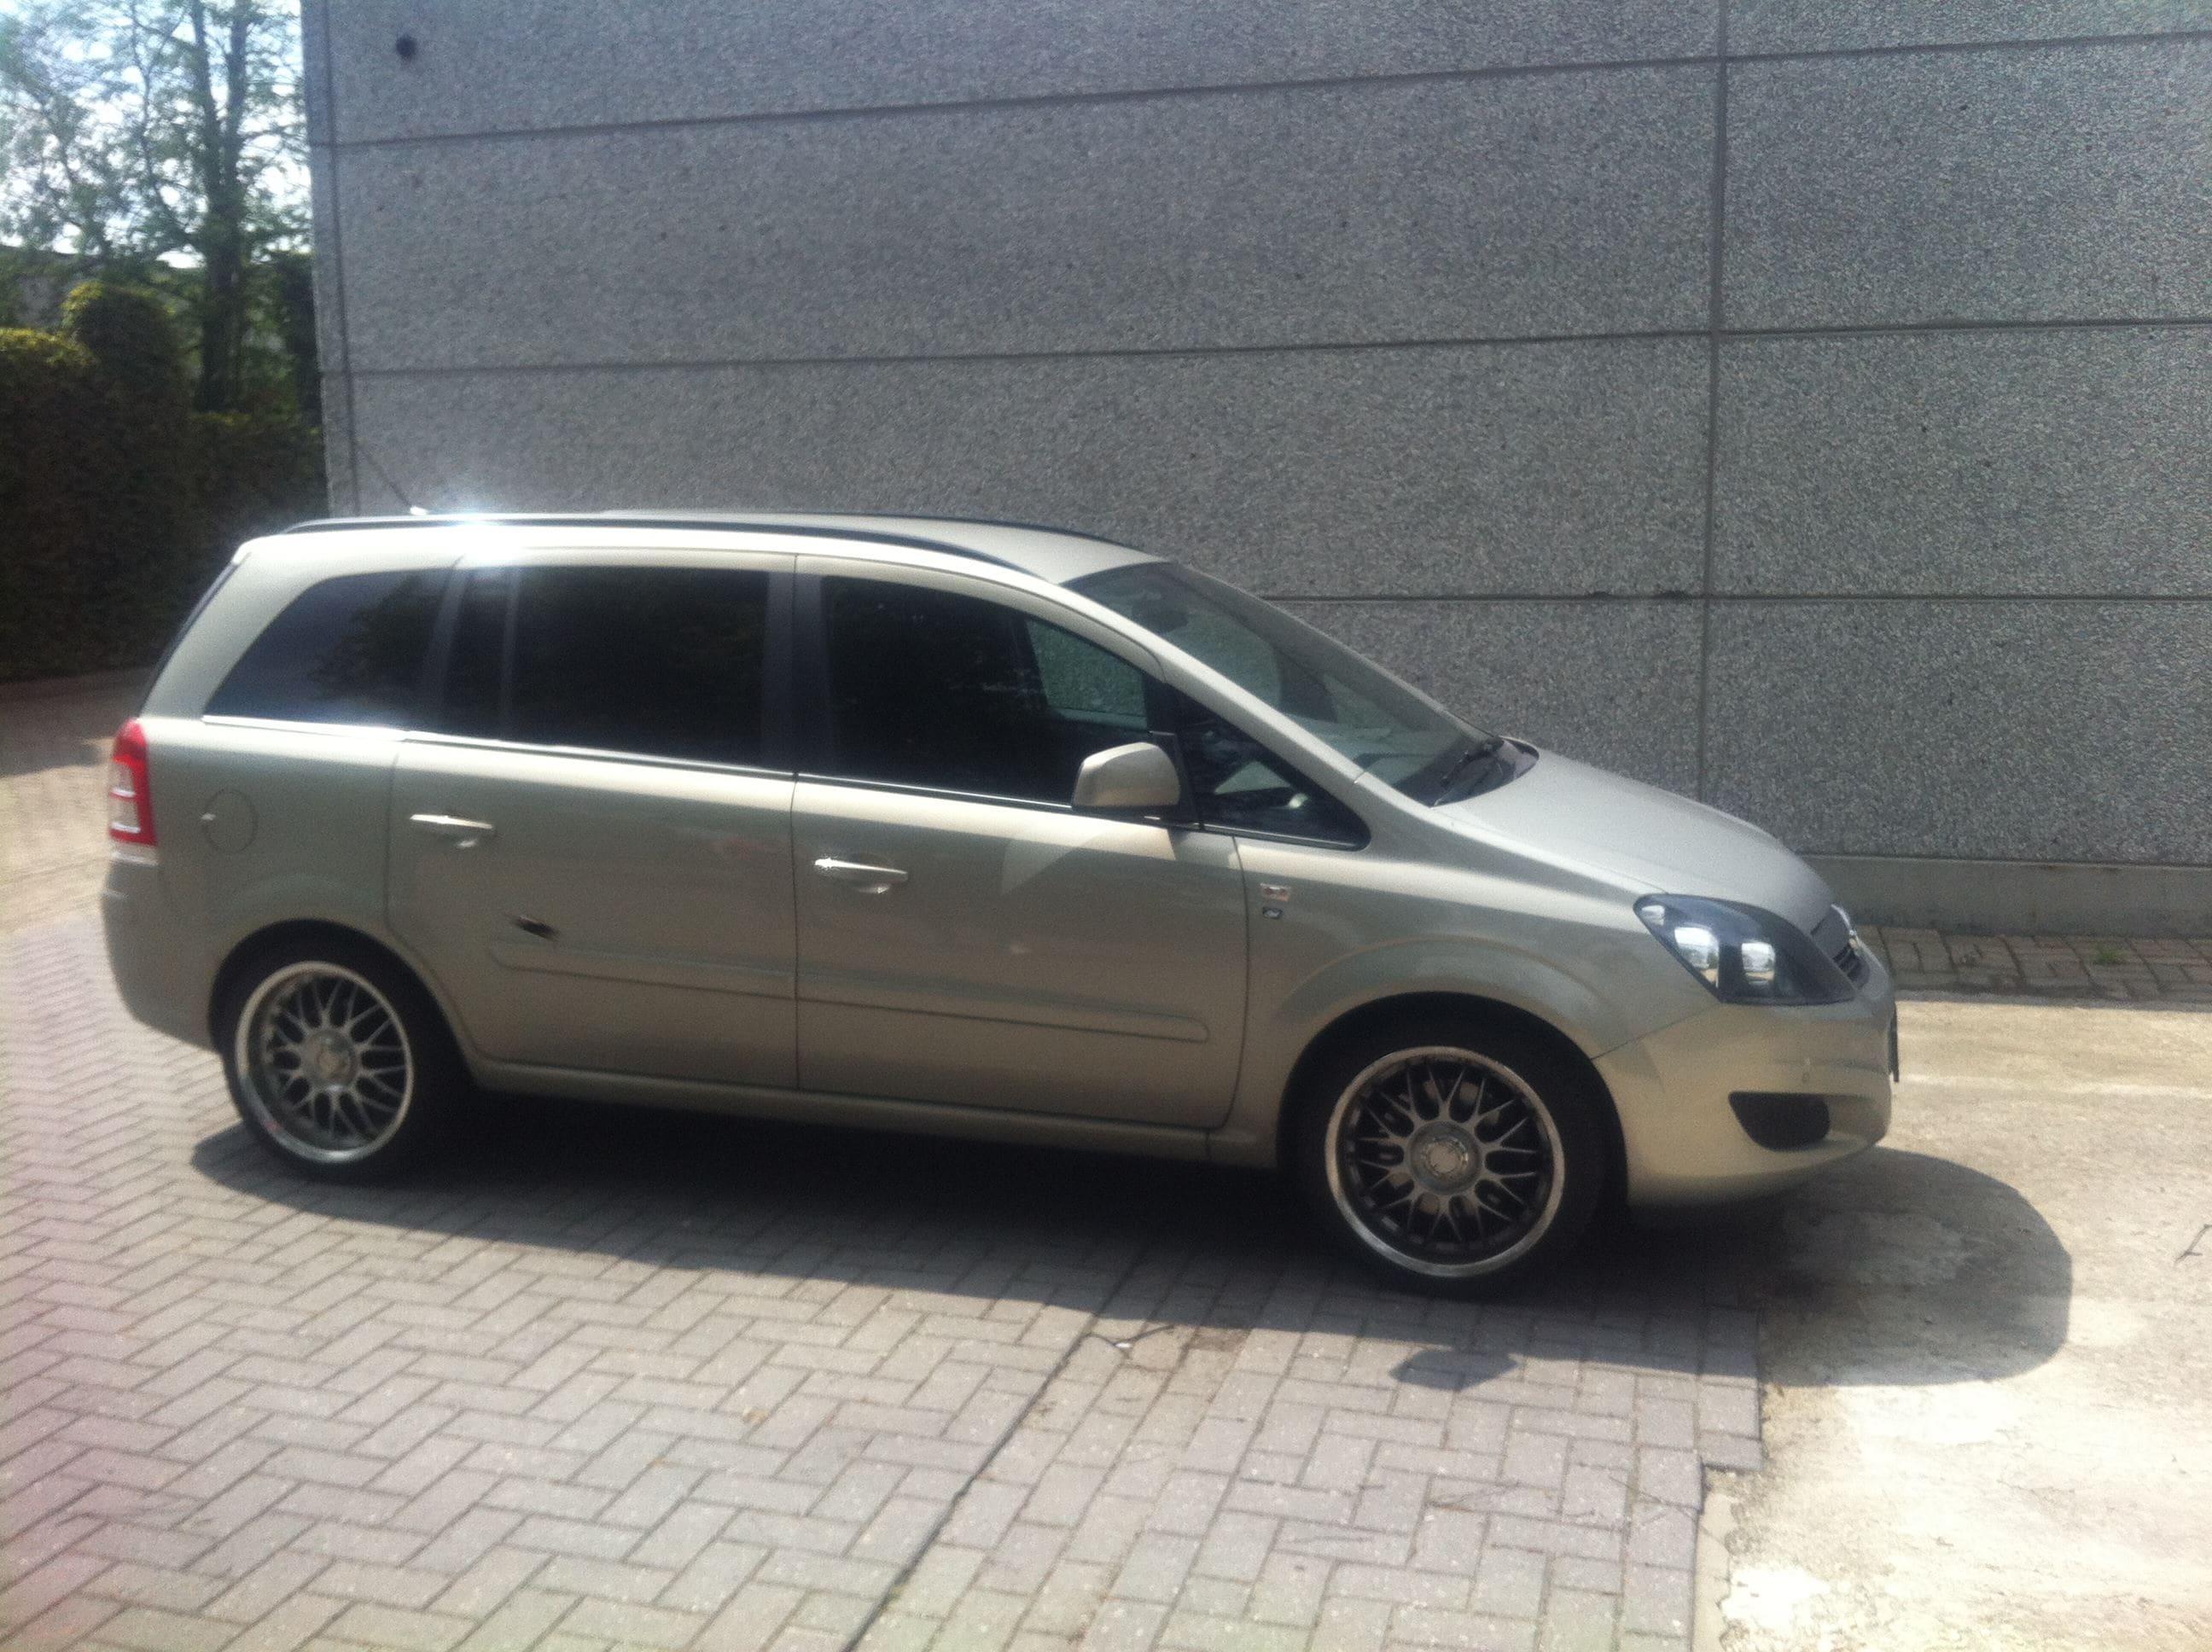 Opel Zafira met Two-Tone Wrap, Carwrapping door Wrapmyride.nu Foto-nr:6662, ©2021